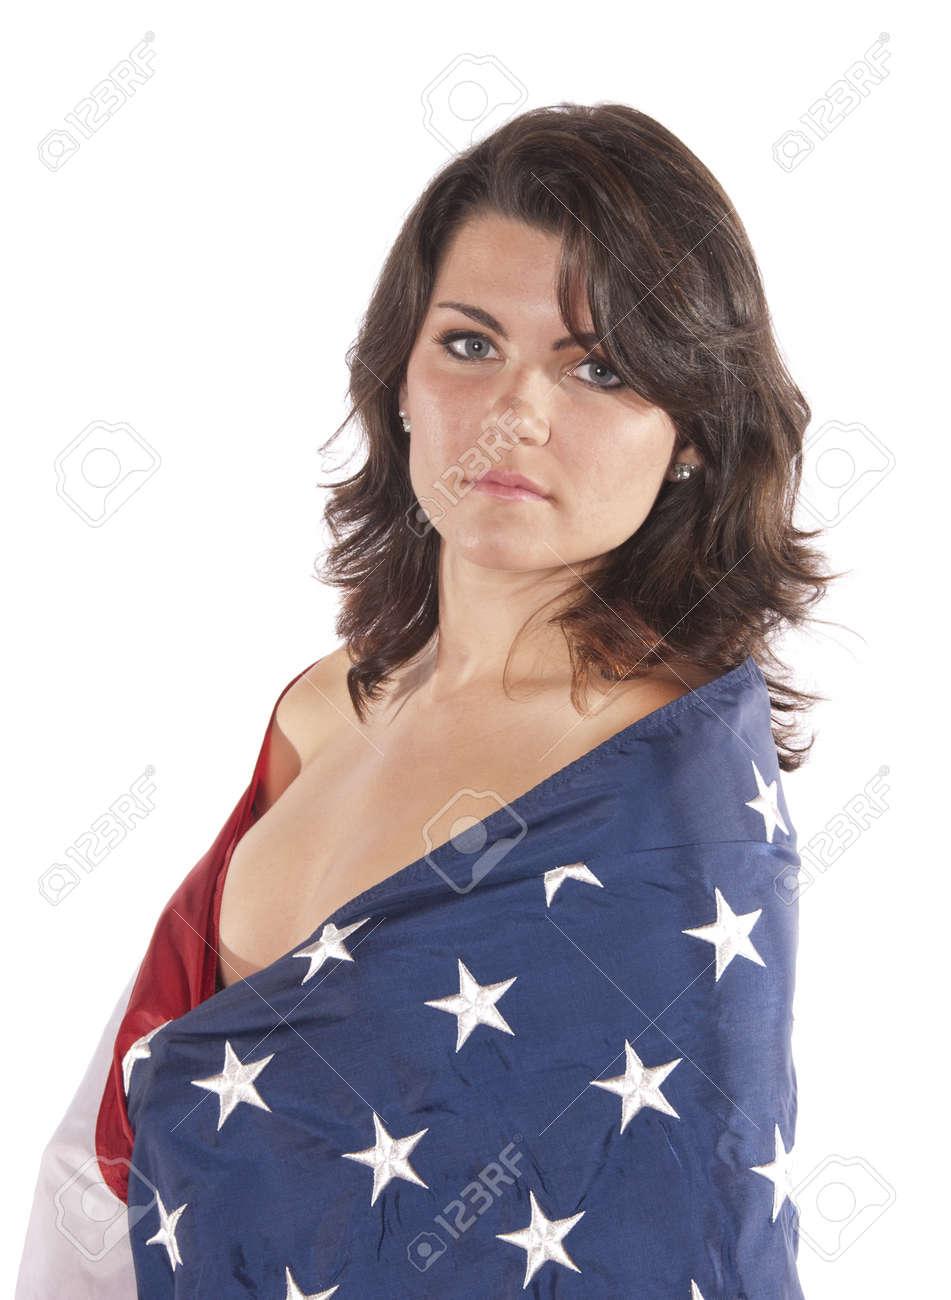 Porno Tube American Young Nude Girl